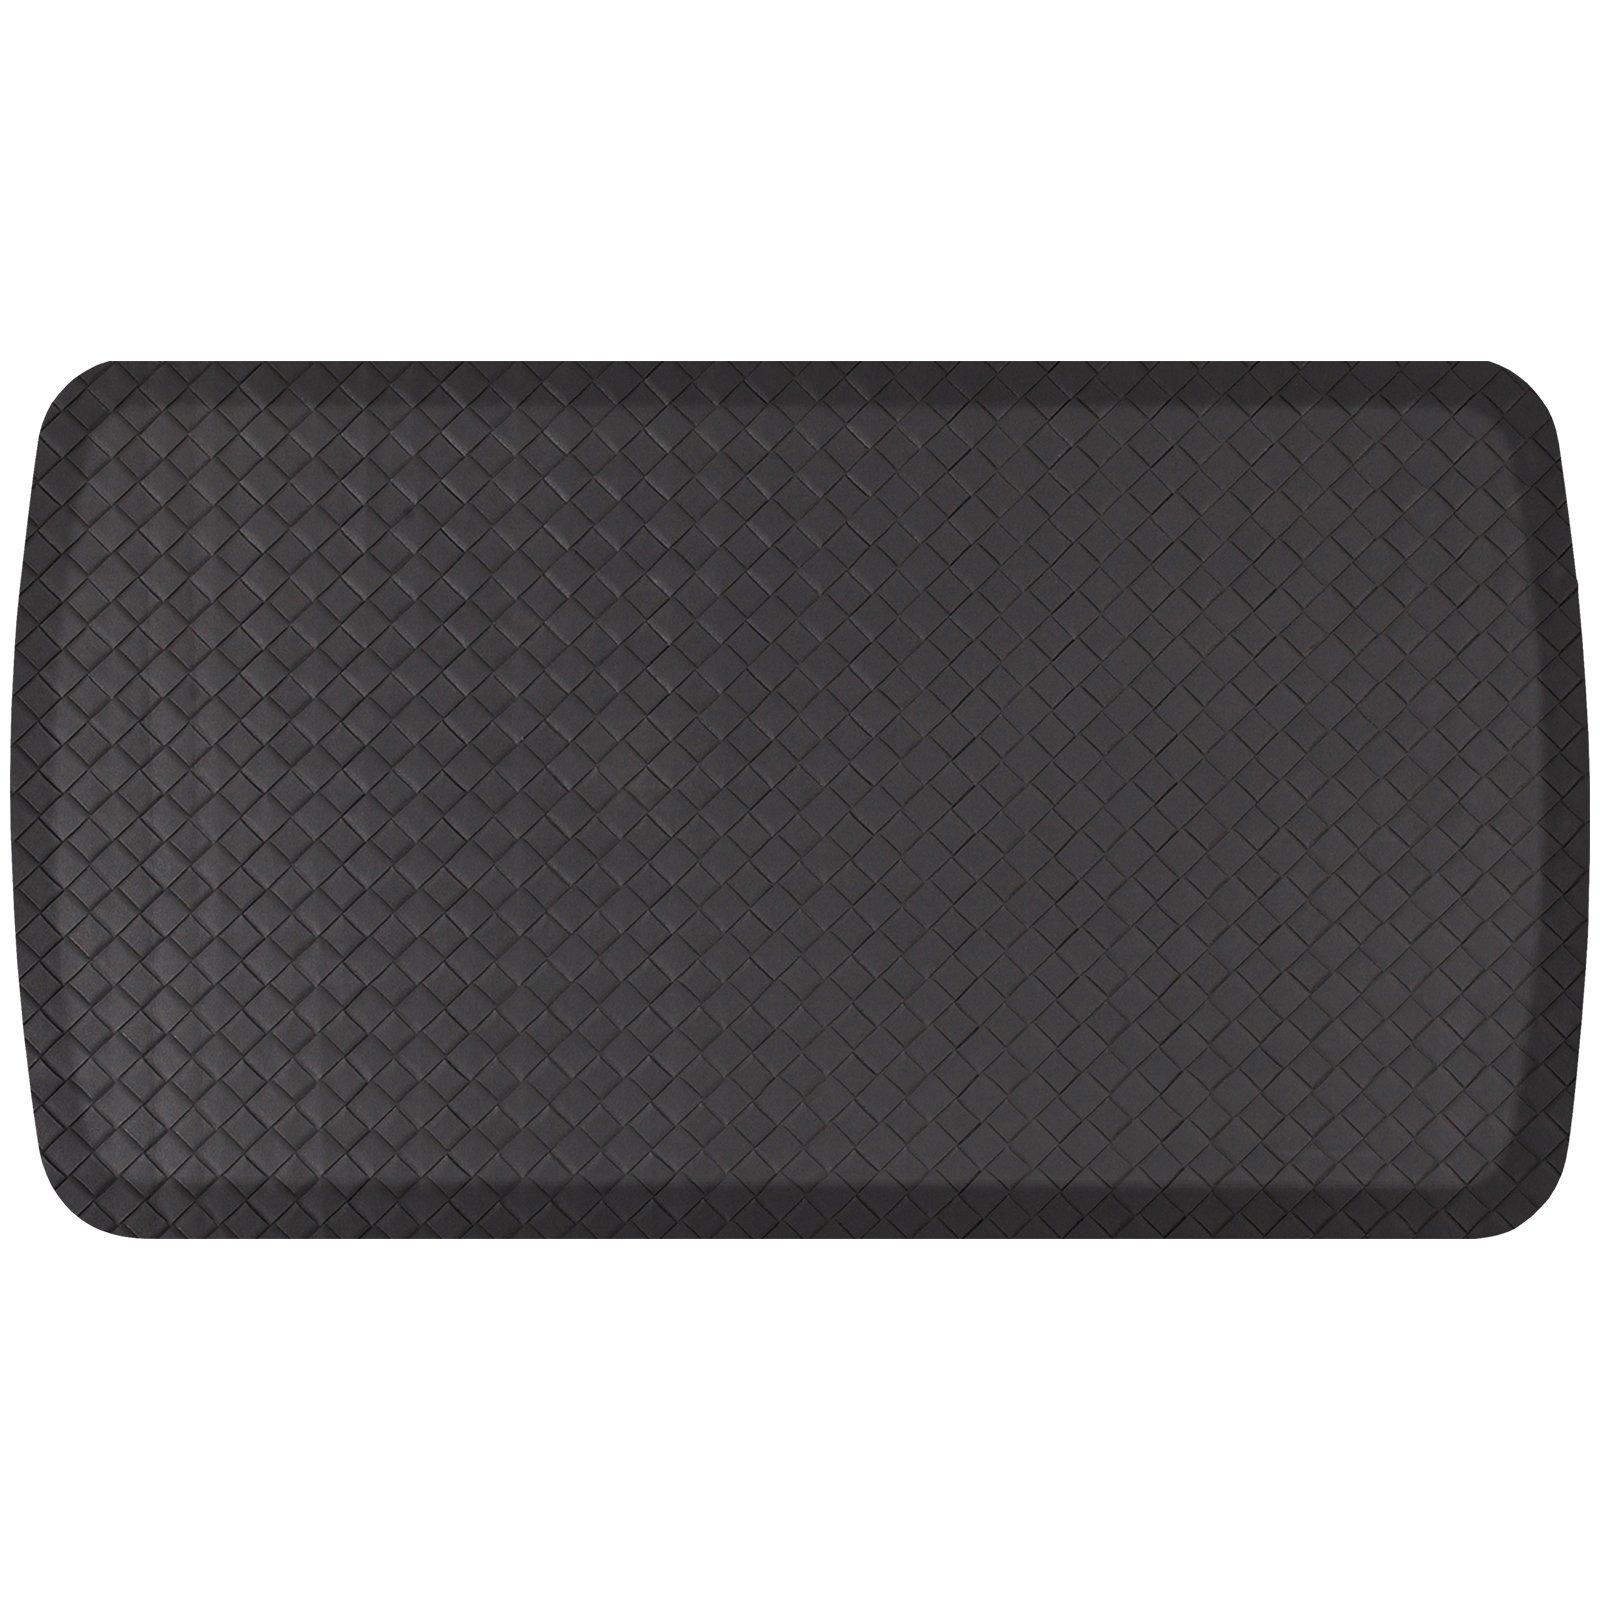 GelPro Elite Premier Kitchen Floor Mat, Black, 20 x 36''